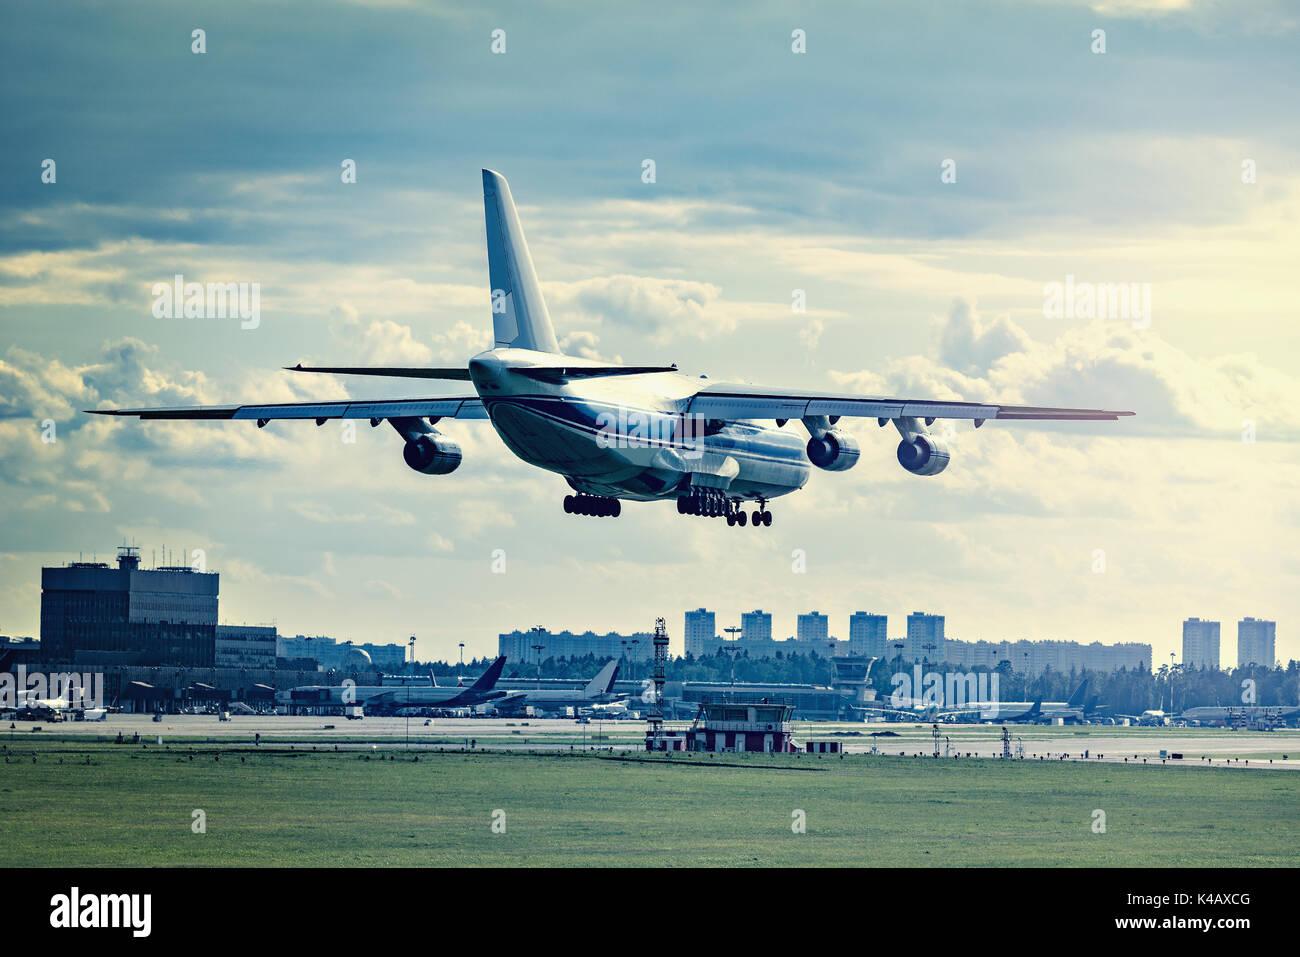 Landing of big cargo airliner. - Stock Image